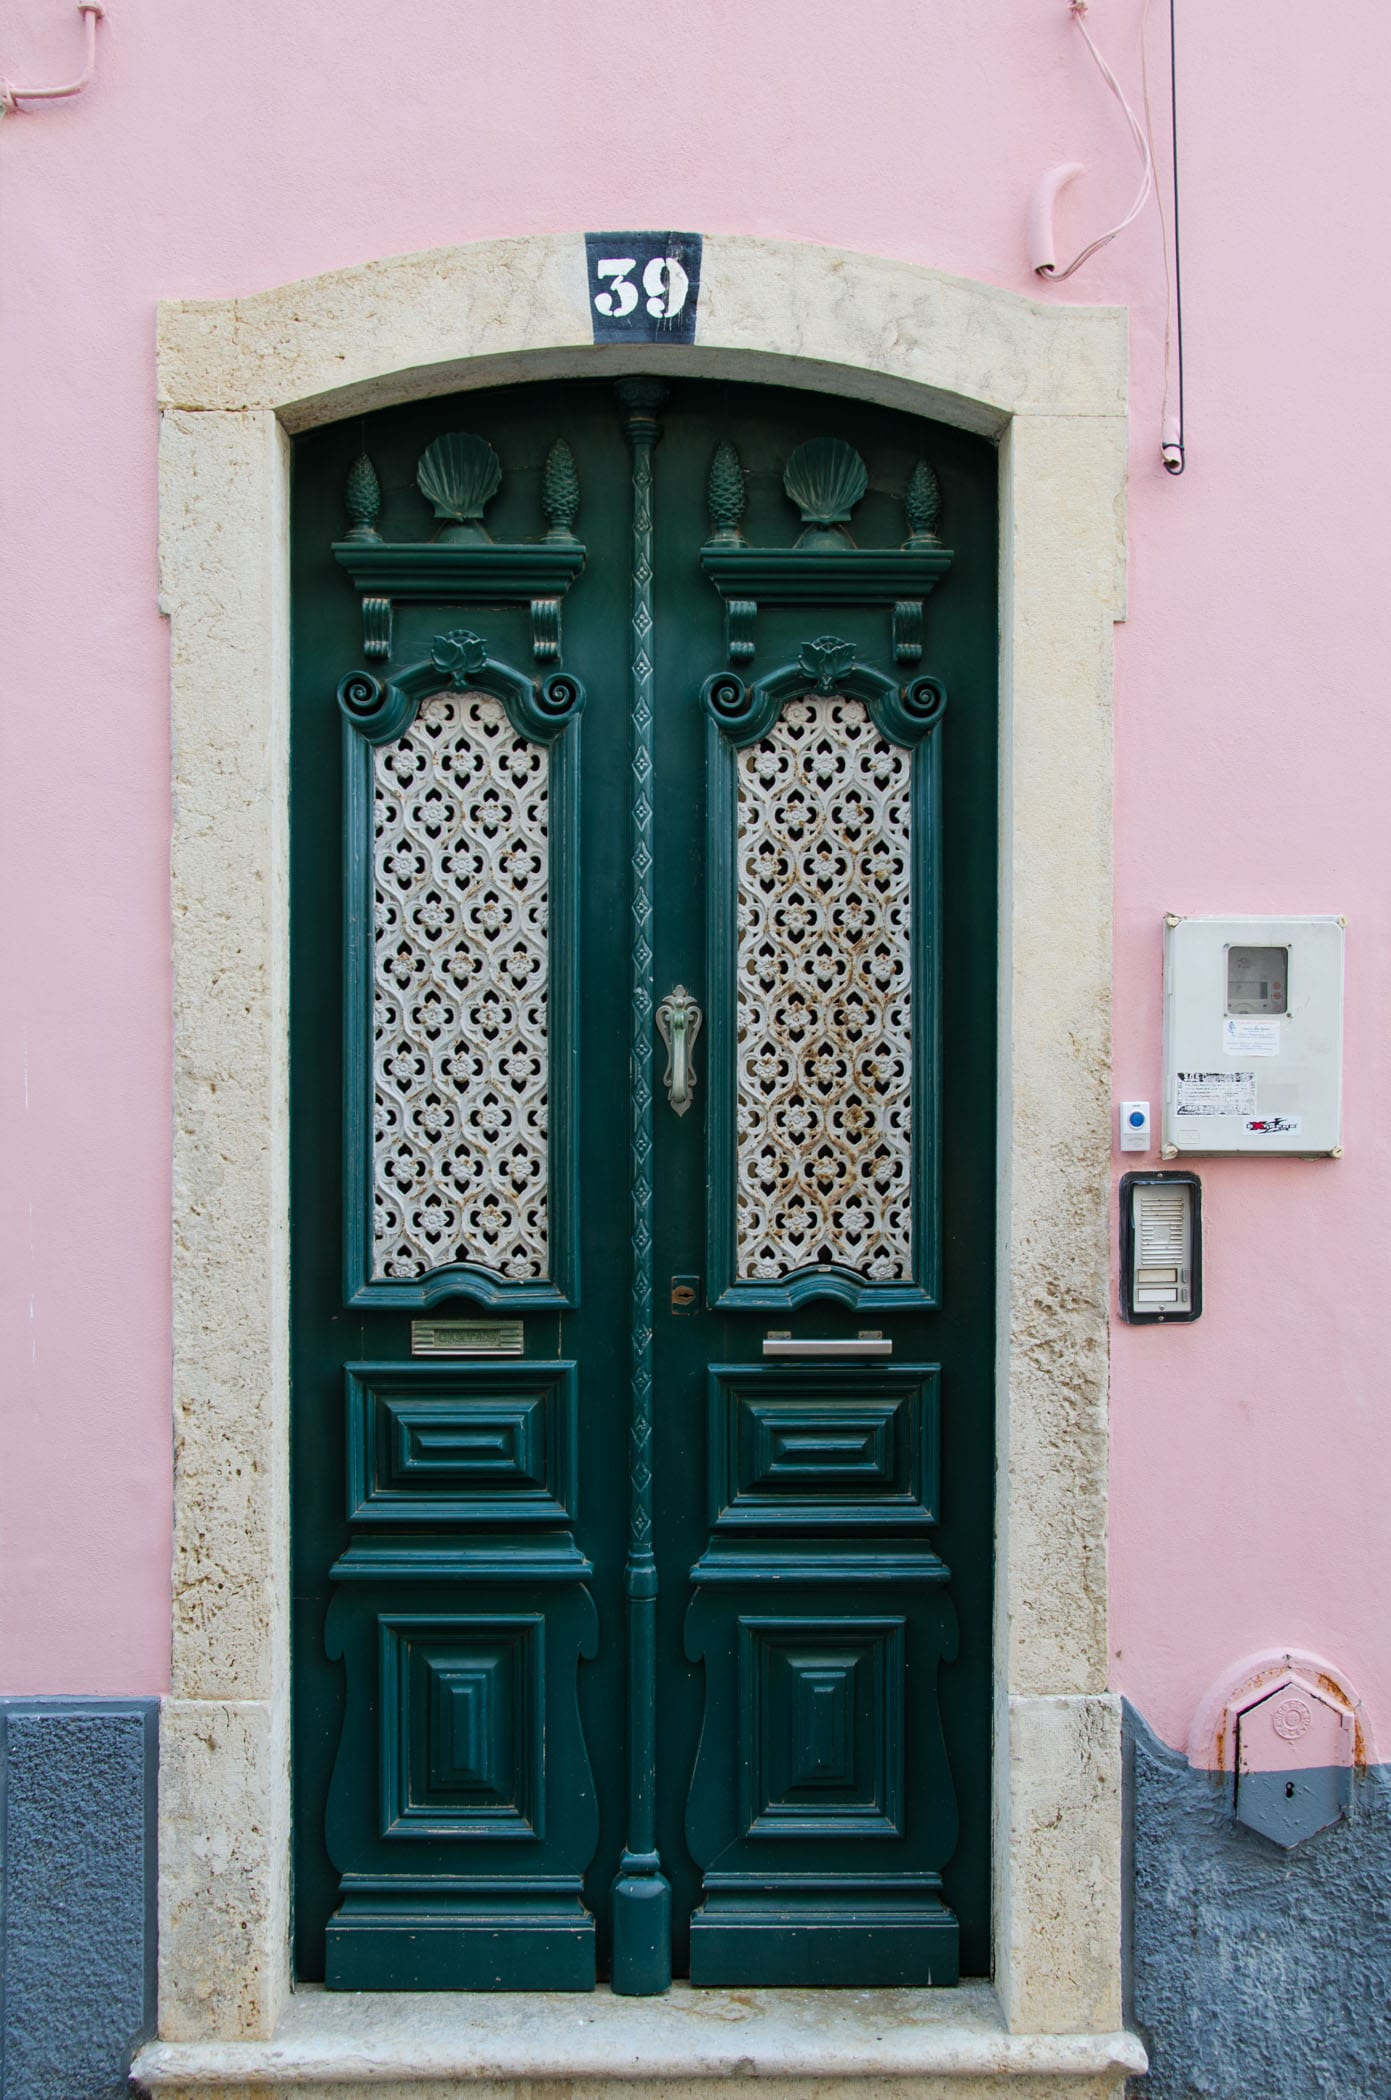 doors, lagos, travel, portugal